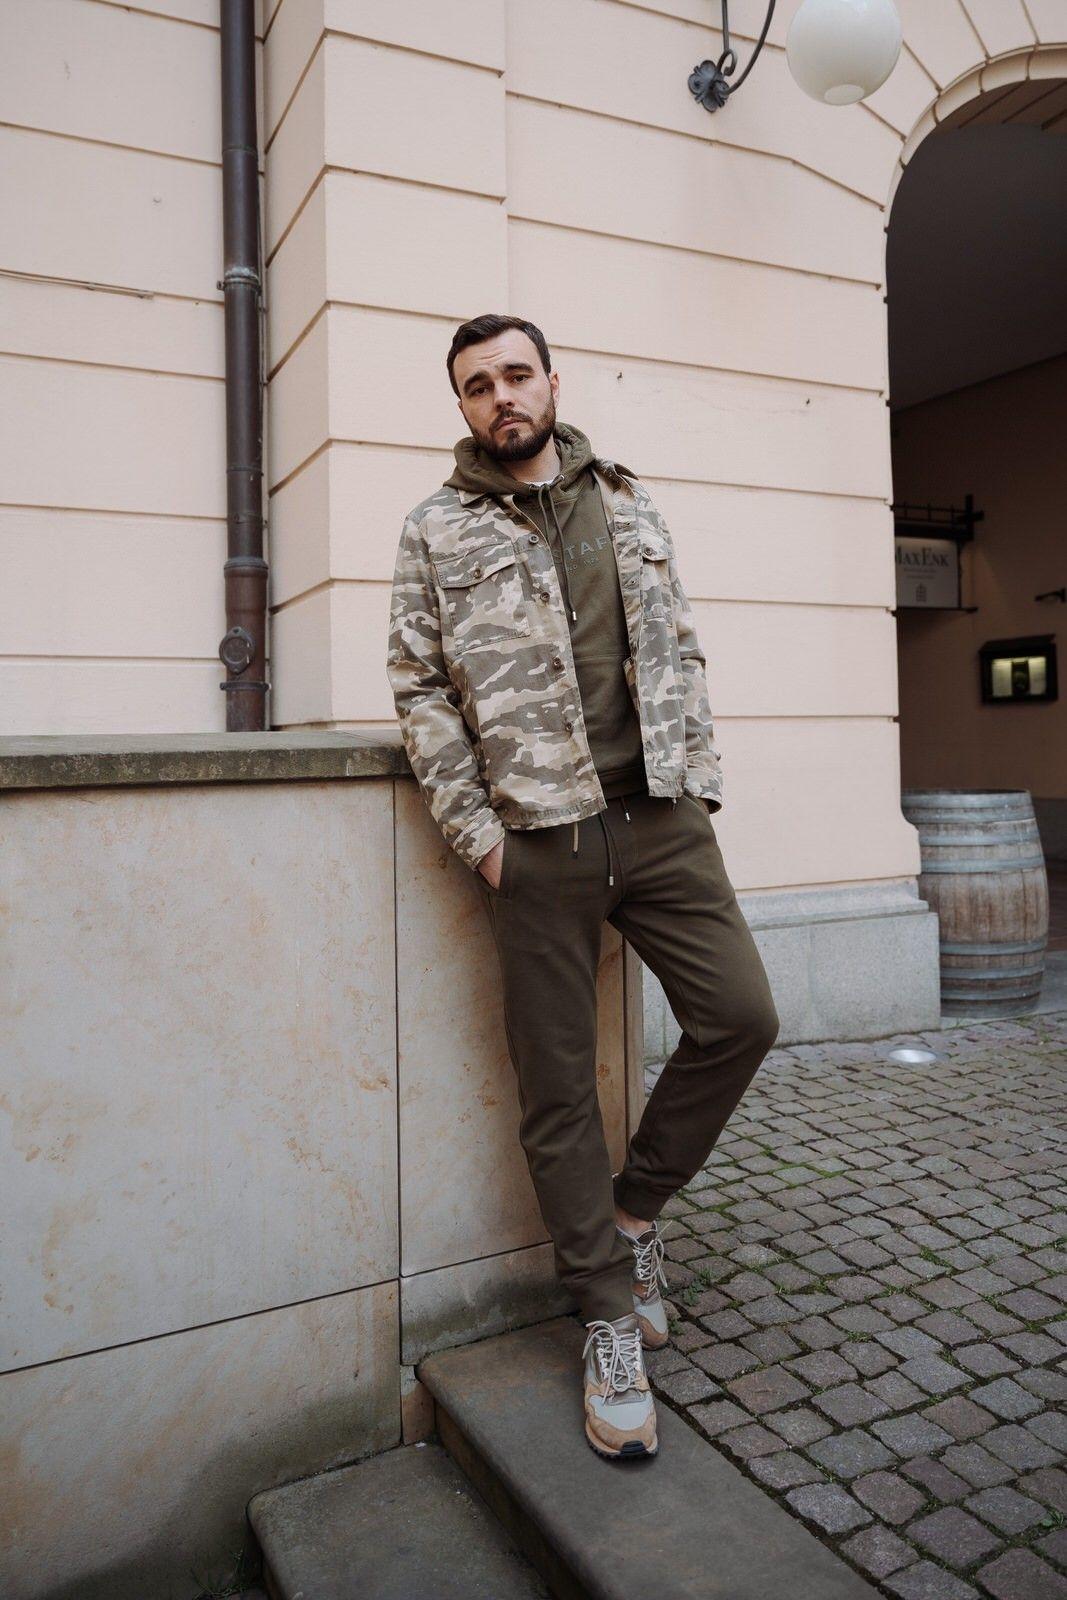 BELSTAFF - Herren Overshirt - Recon Camo Overshirt - Tarp